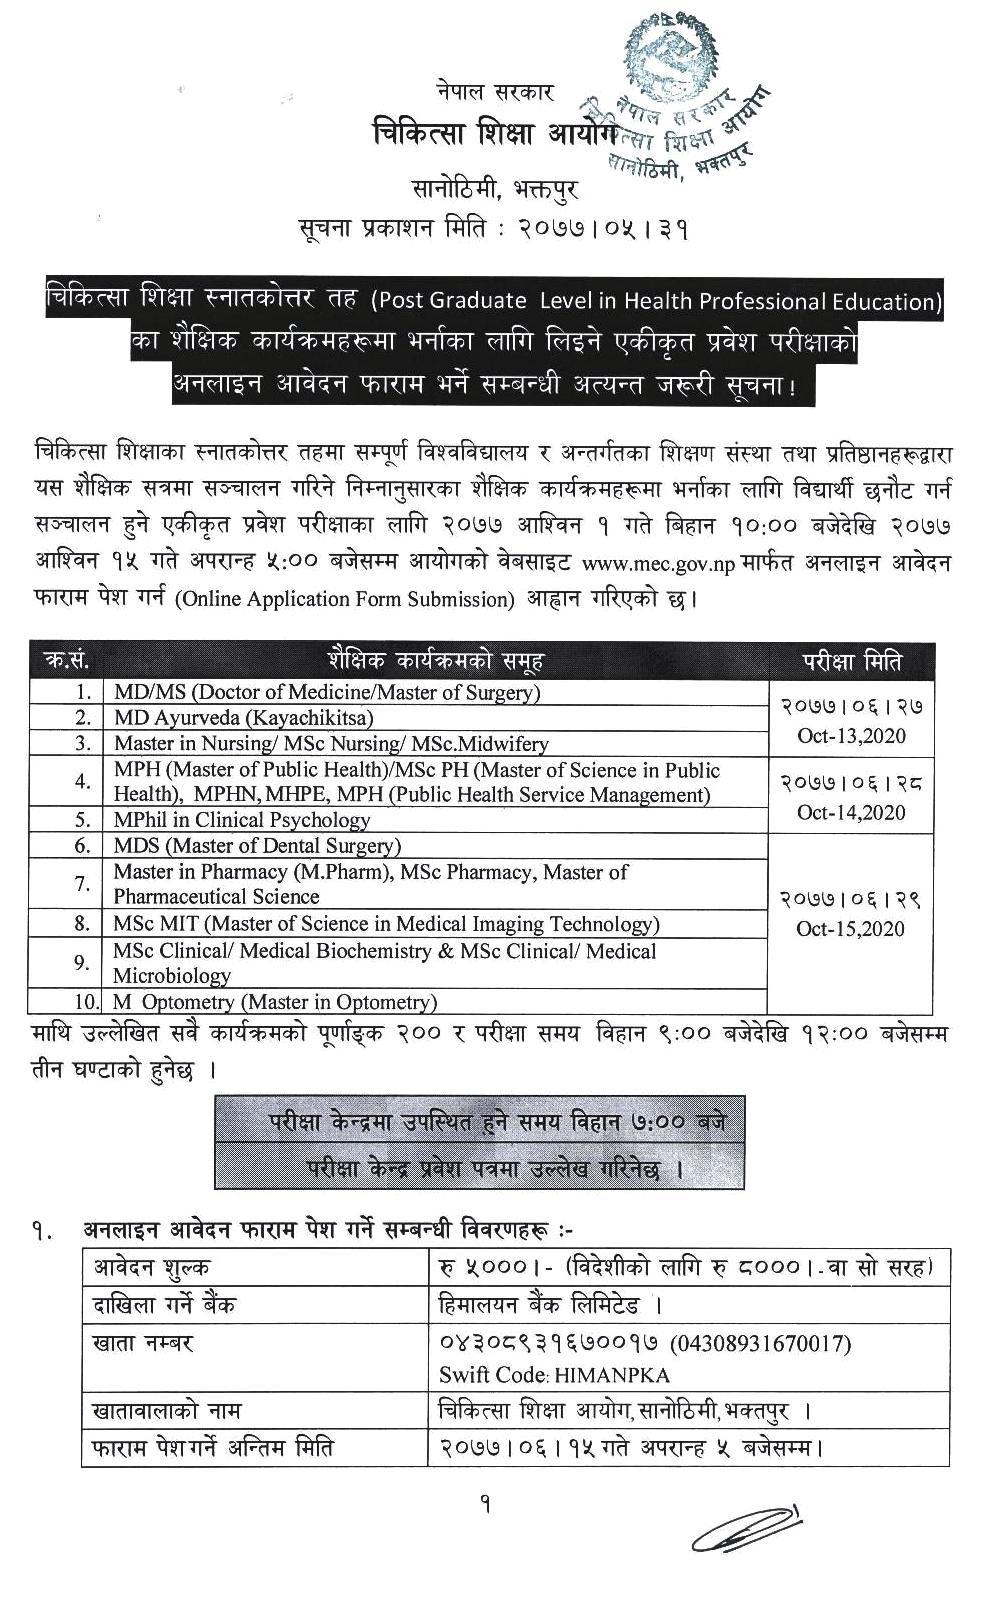 MD/MS Master in Nursing MPH Moptom admission Notice